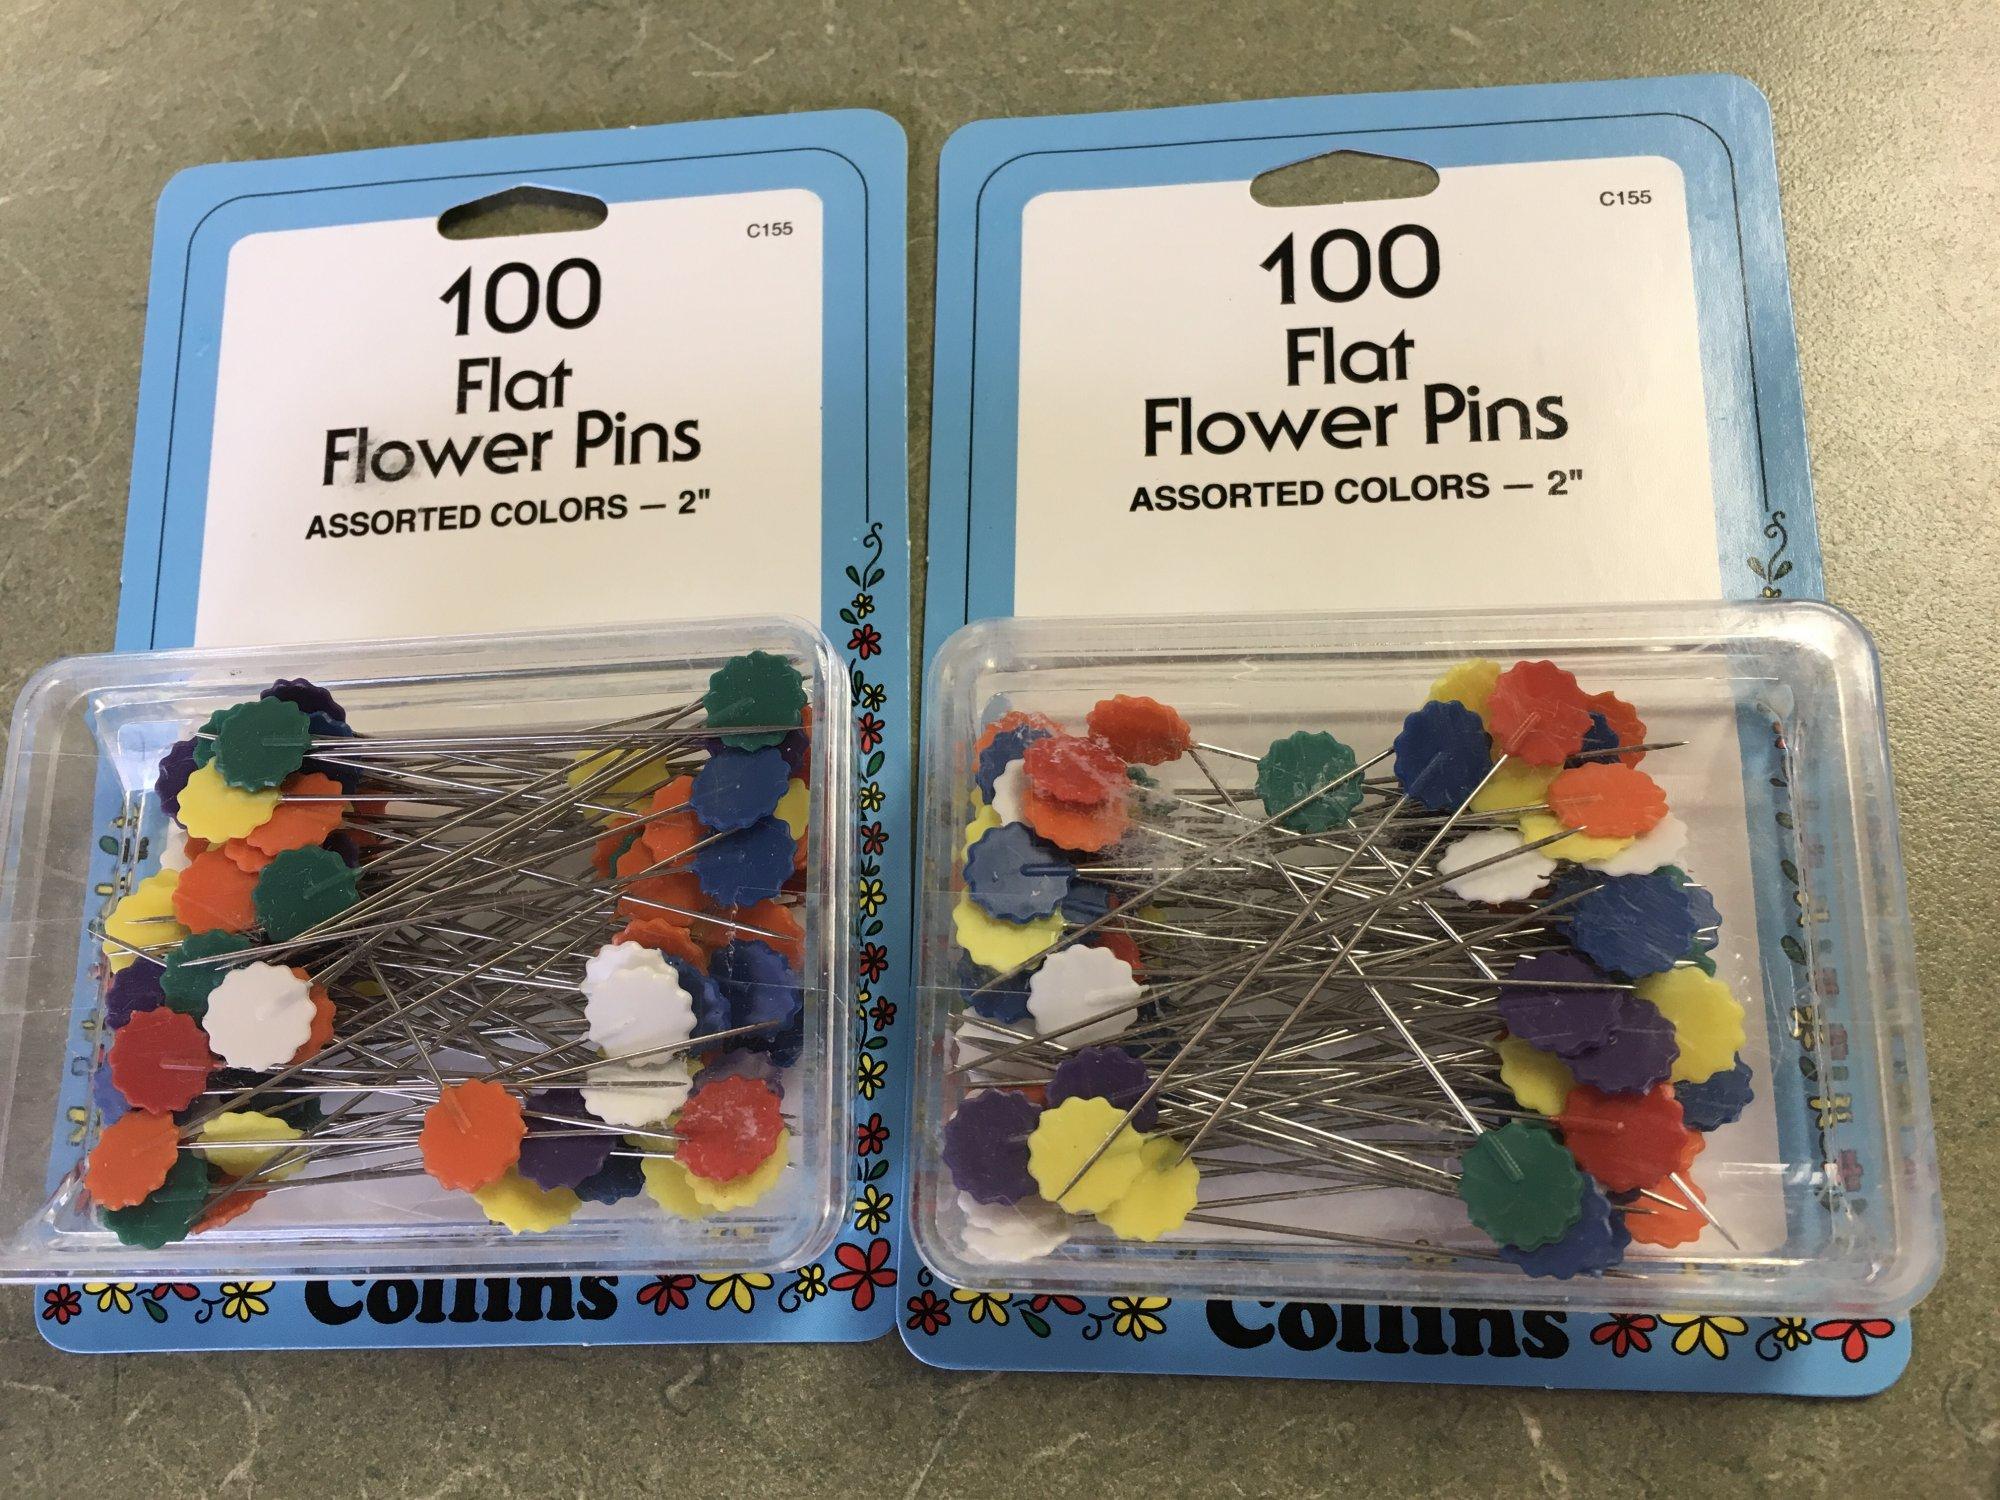 100 Flat Flower Pins 2 inch